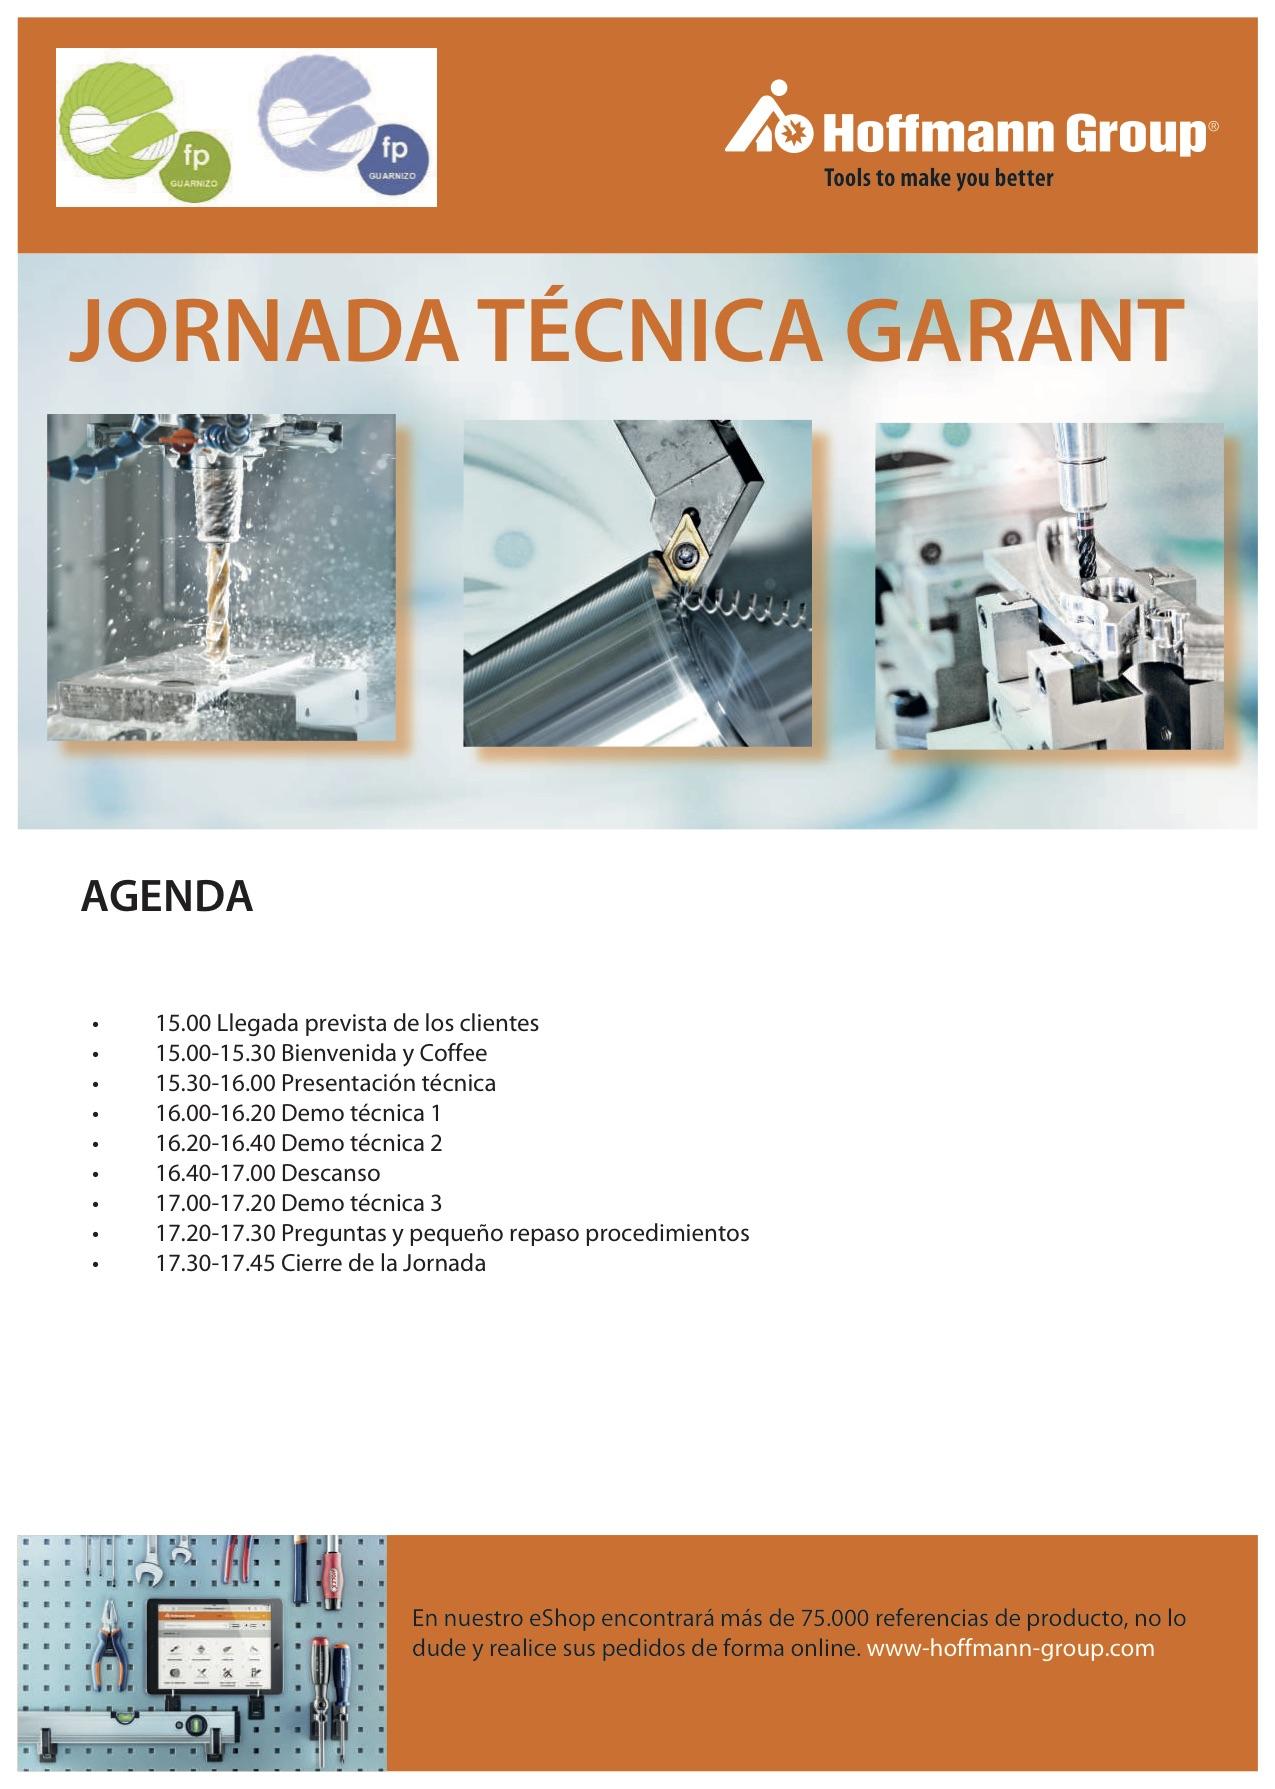 Agenda Jornada Técnica compressed